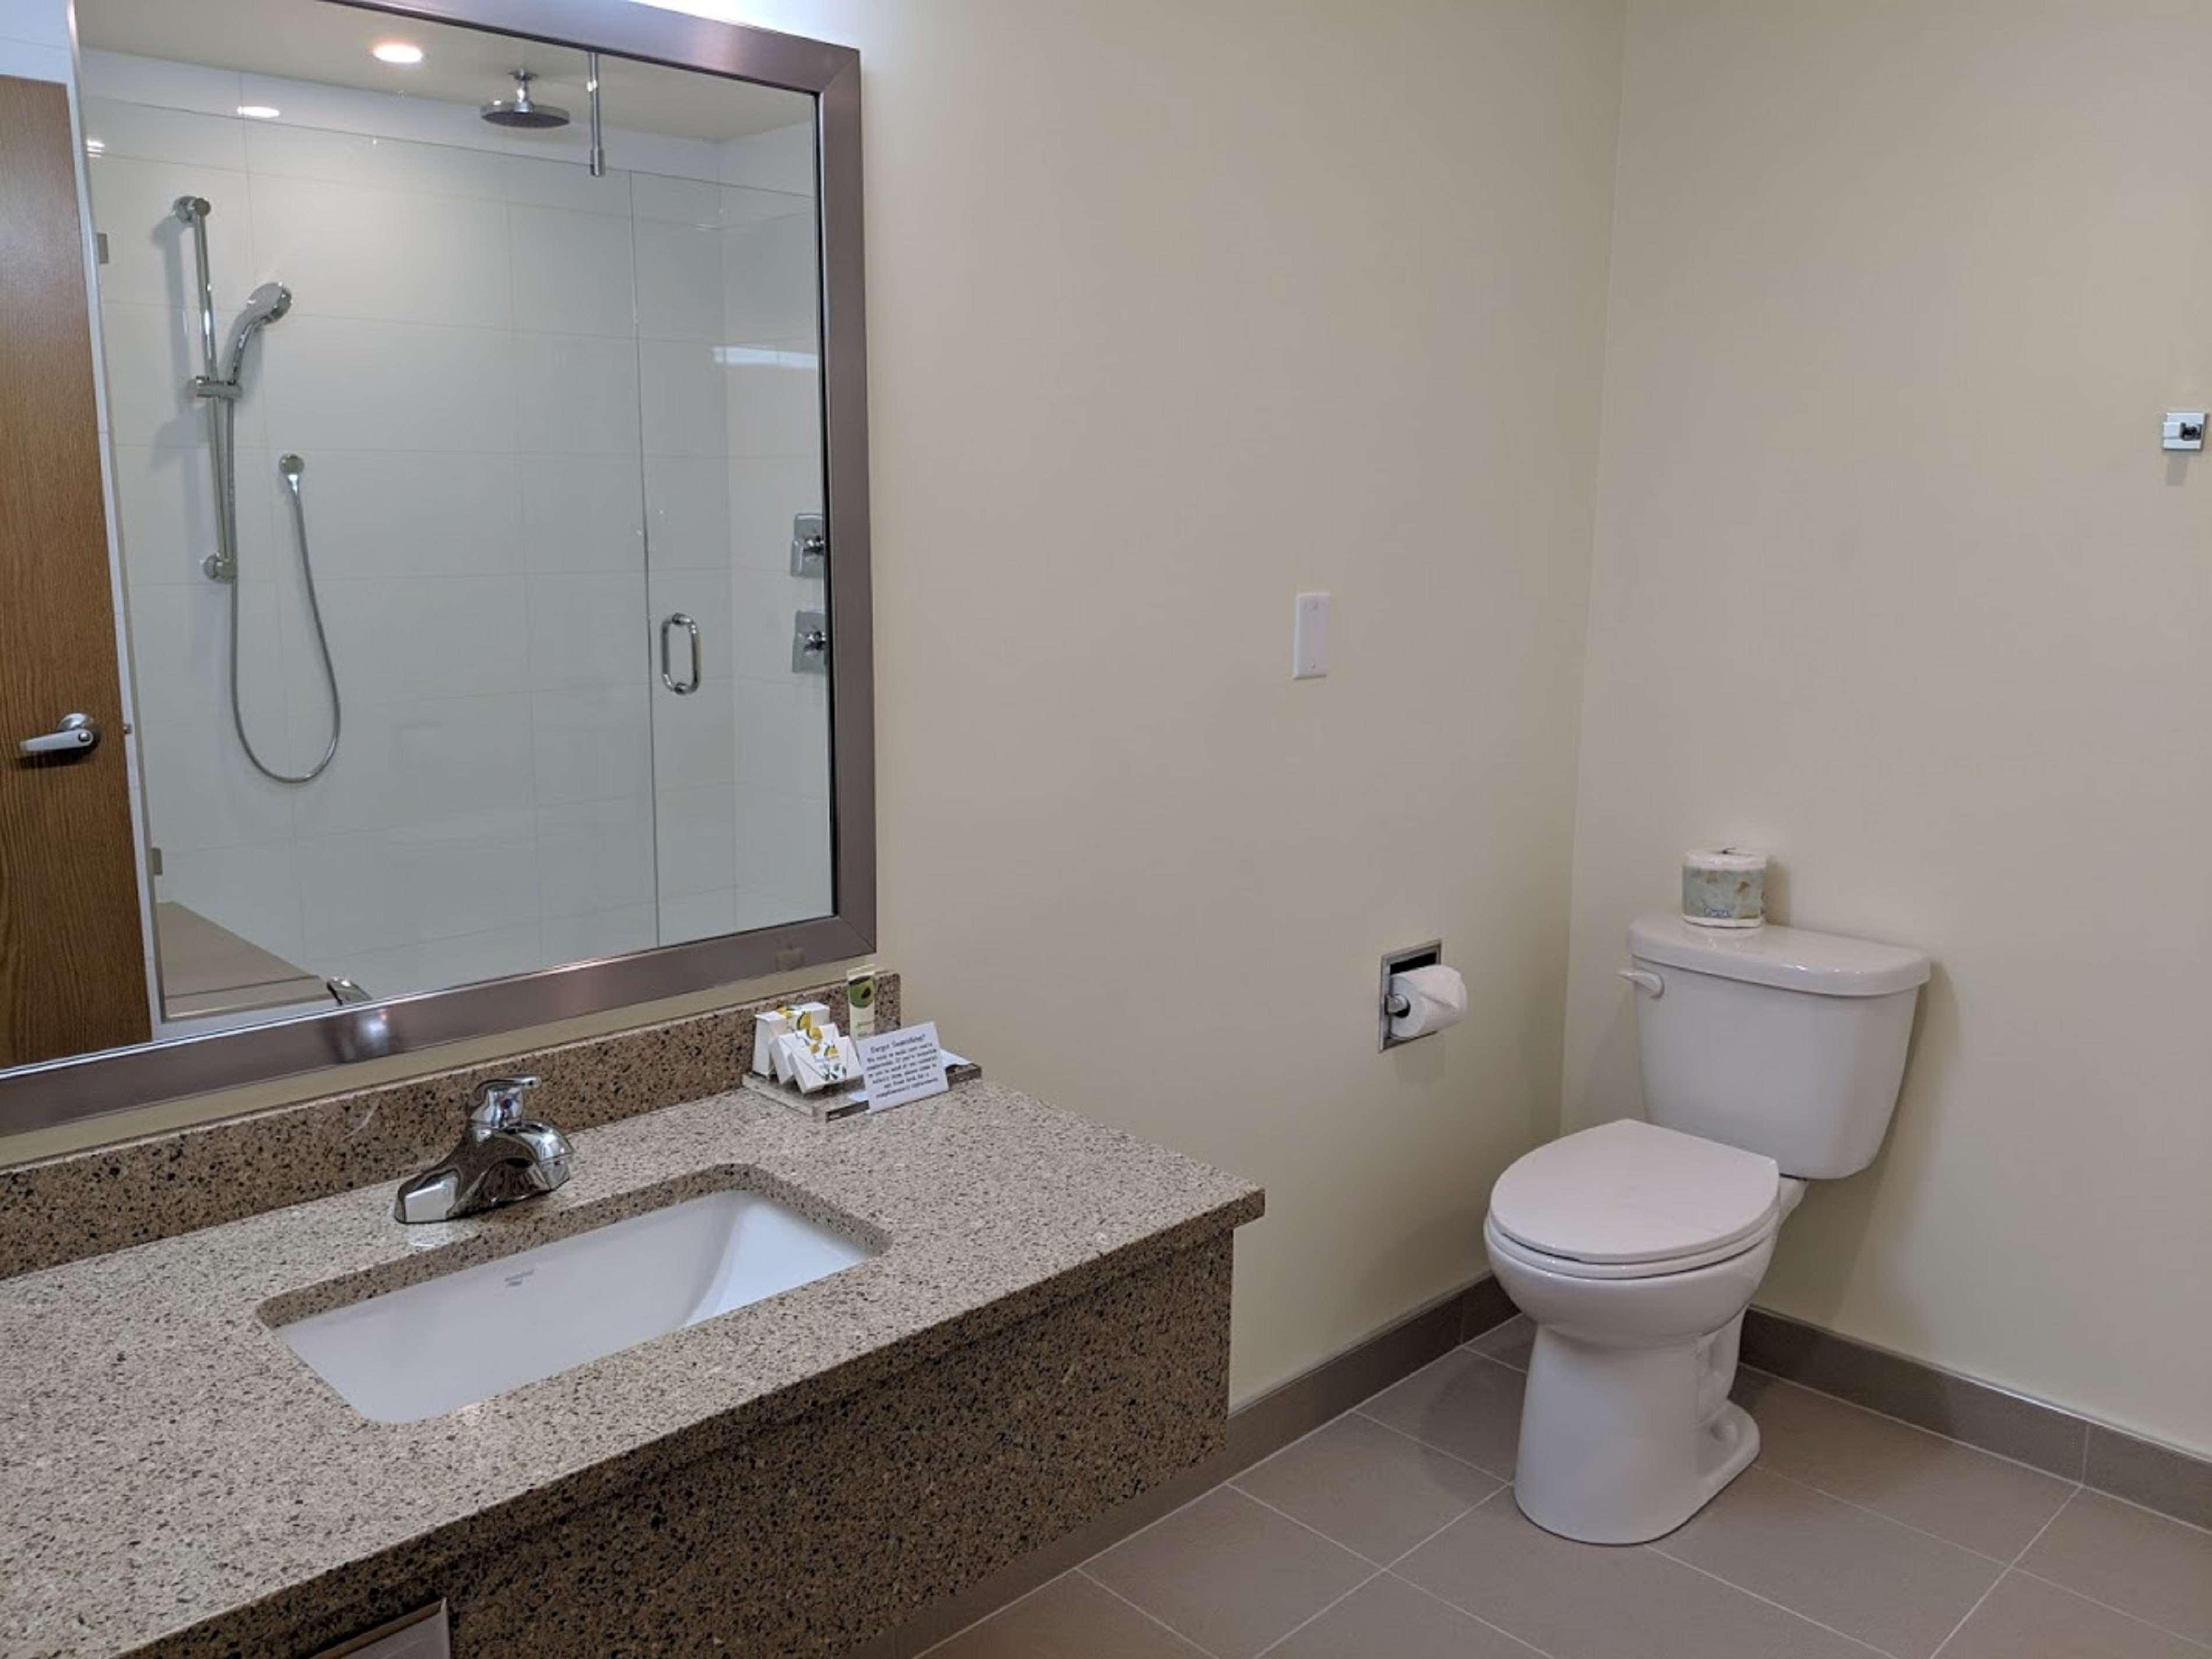 Surestay Hotel By Best Western Chilliwack in Chilliwack: Guest Bathroom Deluxe Room